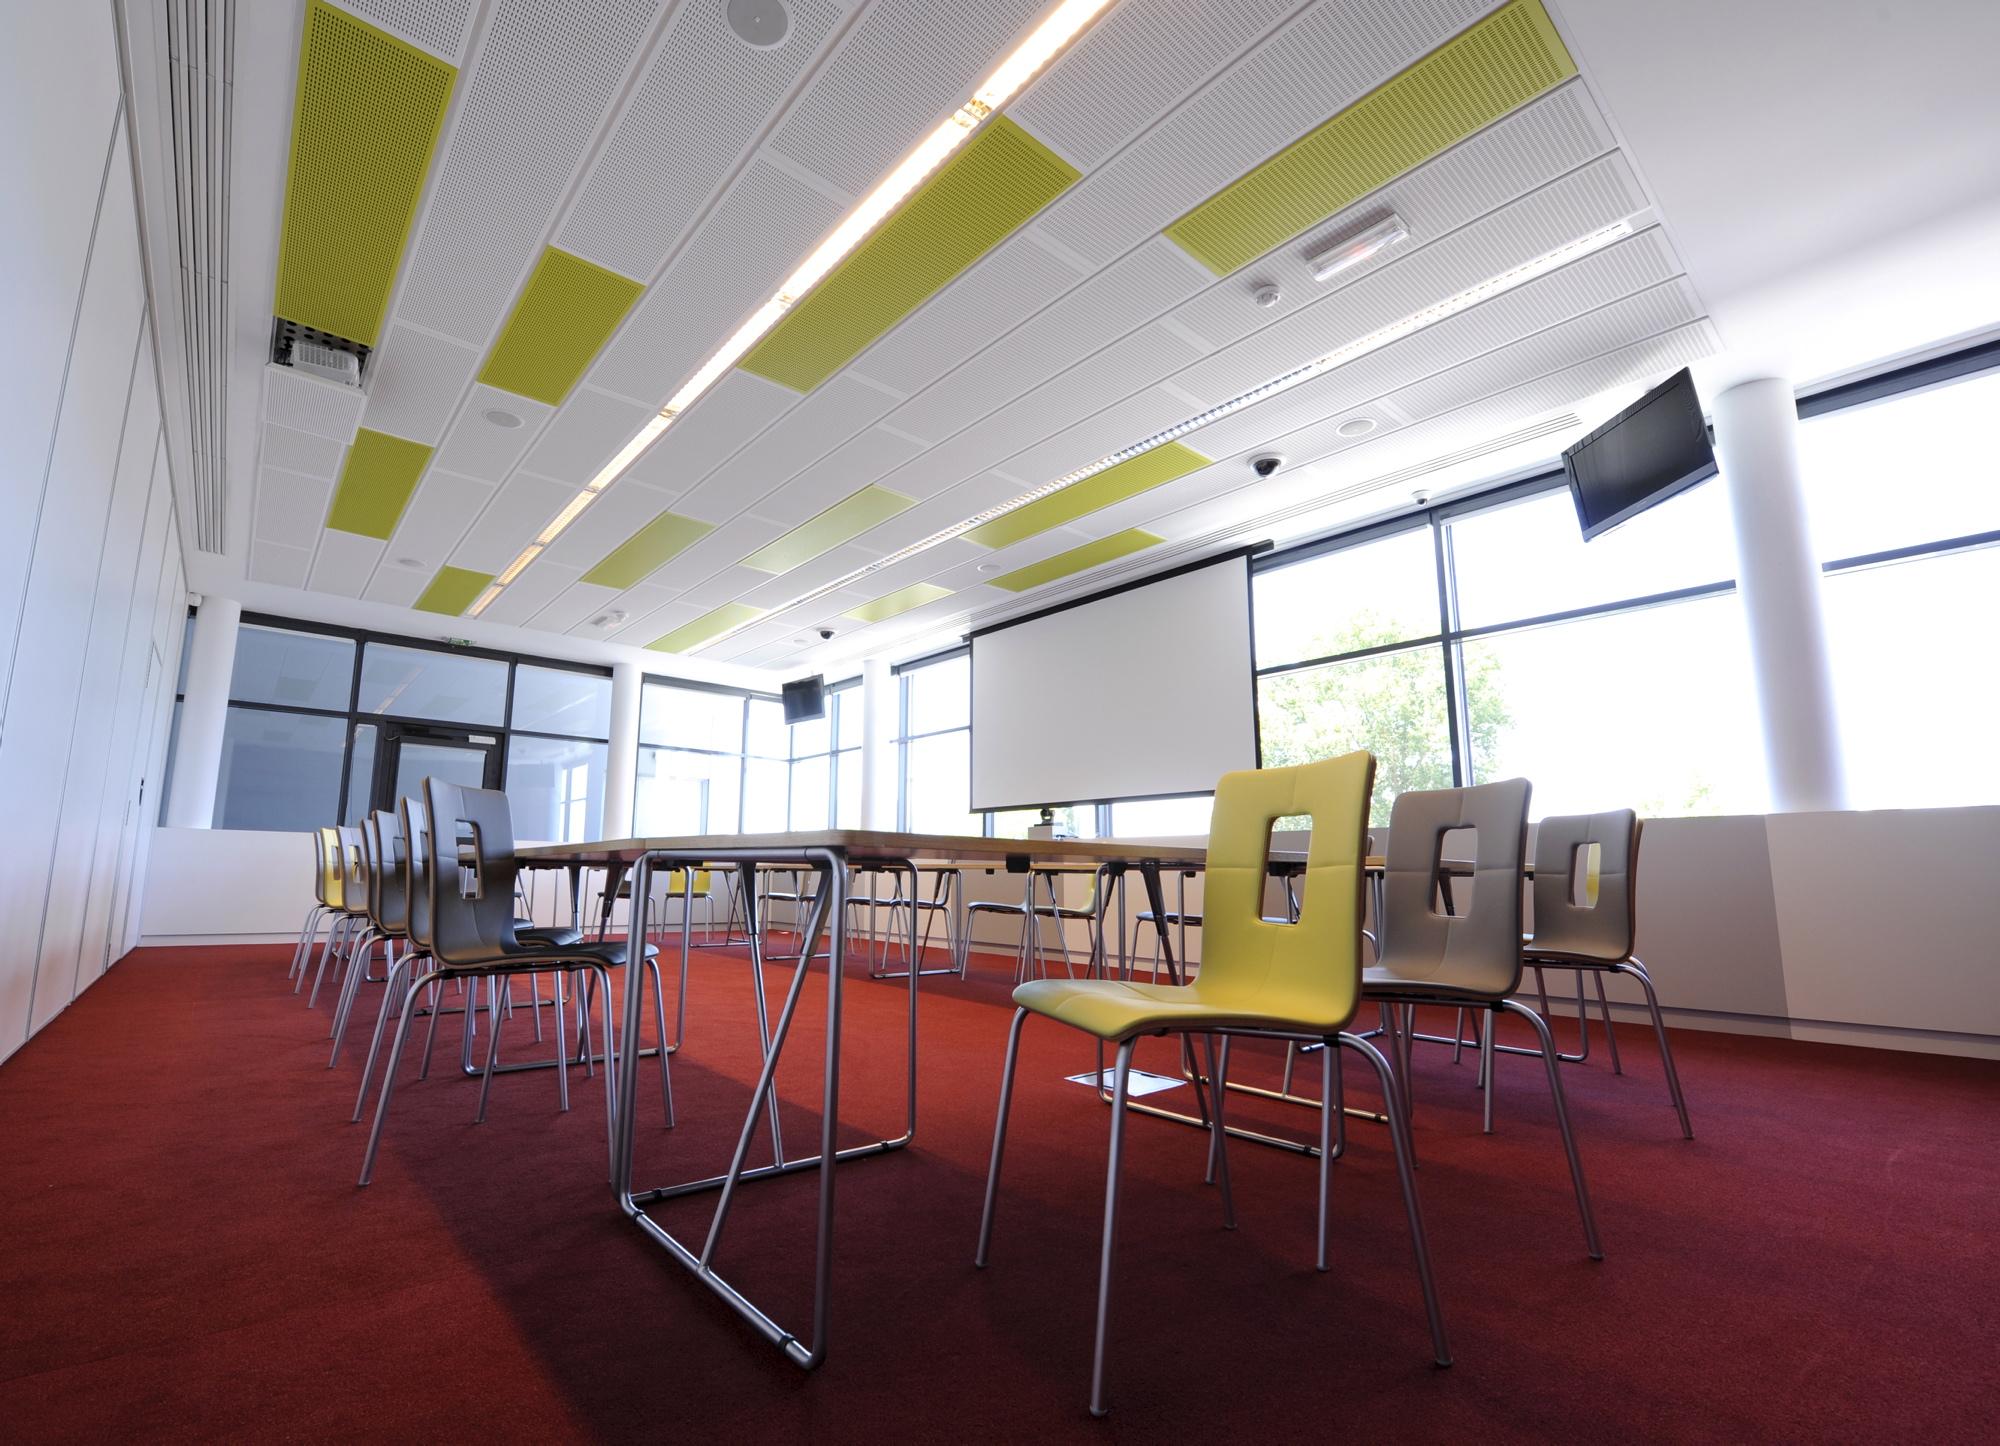 False Ceiling Design For Classroom ~ Visona by knauf danoline archello